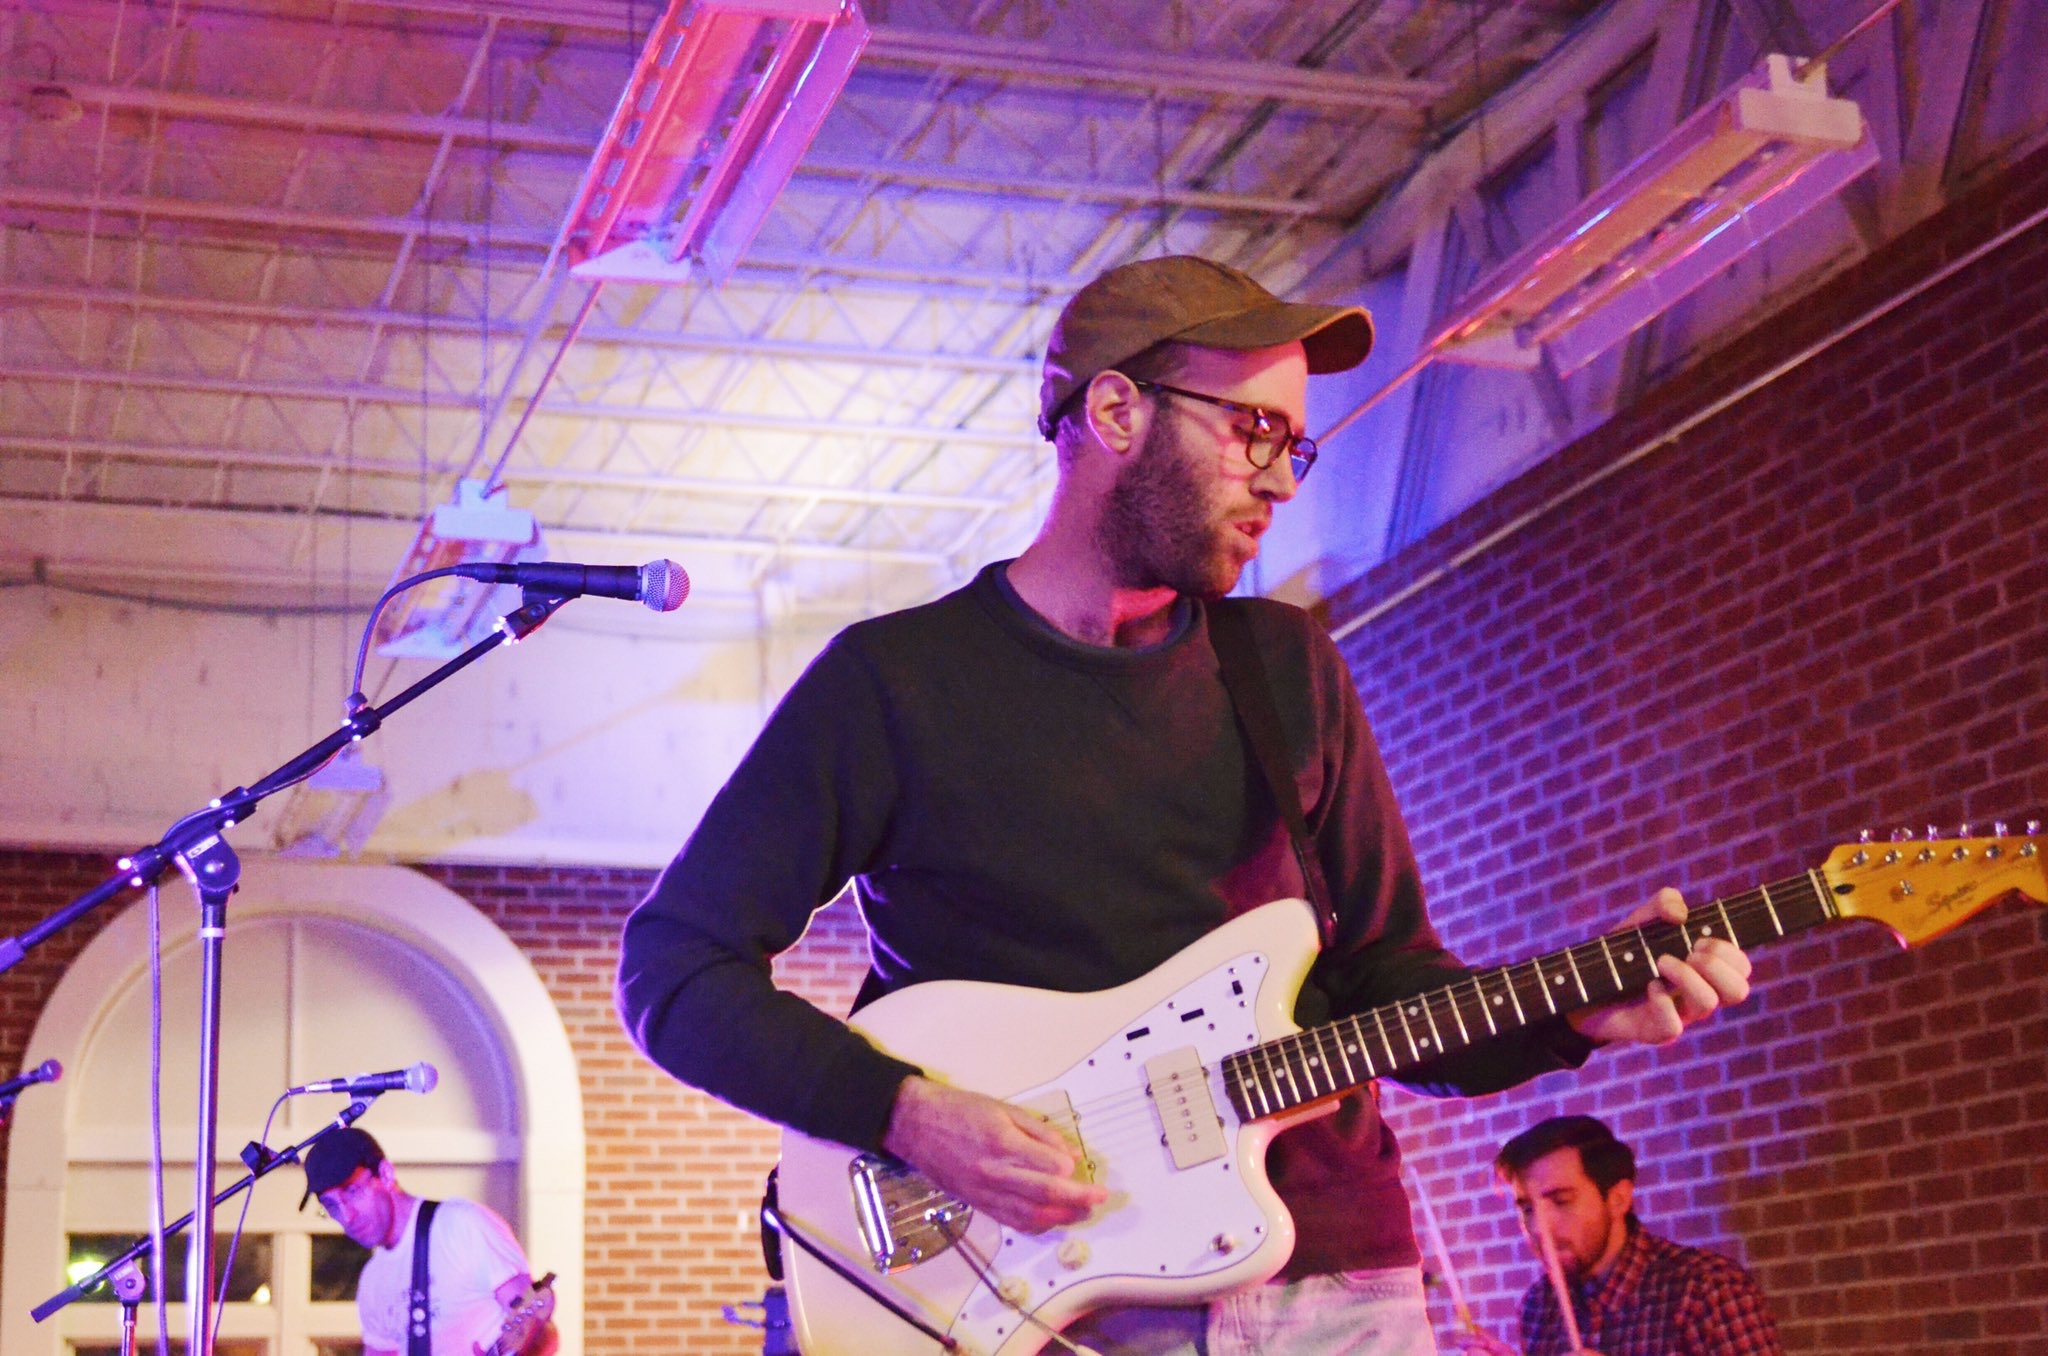 Matt Scottoline - Songwriter, singer, multi-instrumentalist from the indie band Hurry, based in Philadelphia, PA. @Hurryband